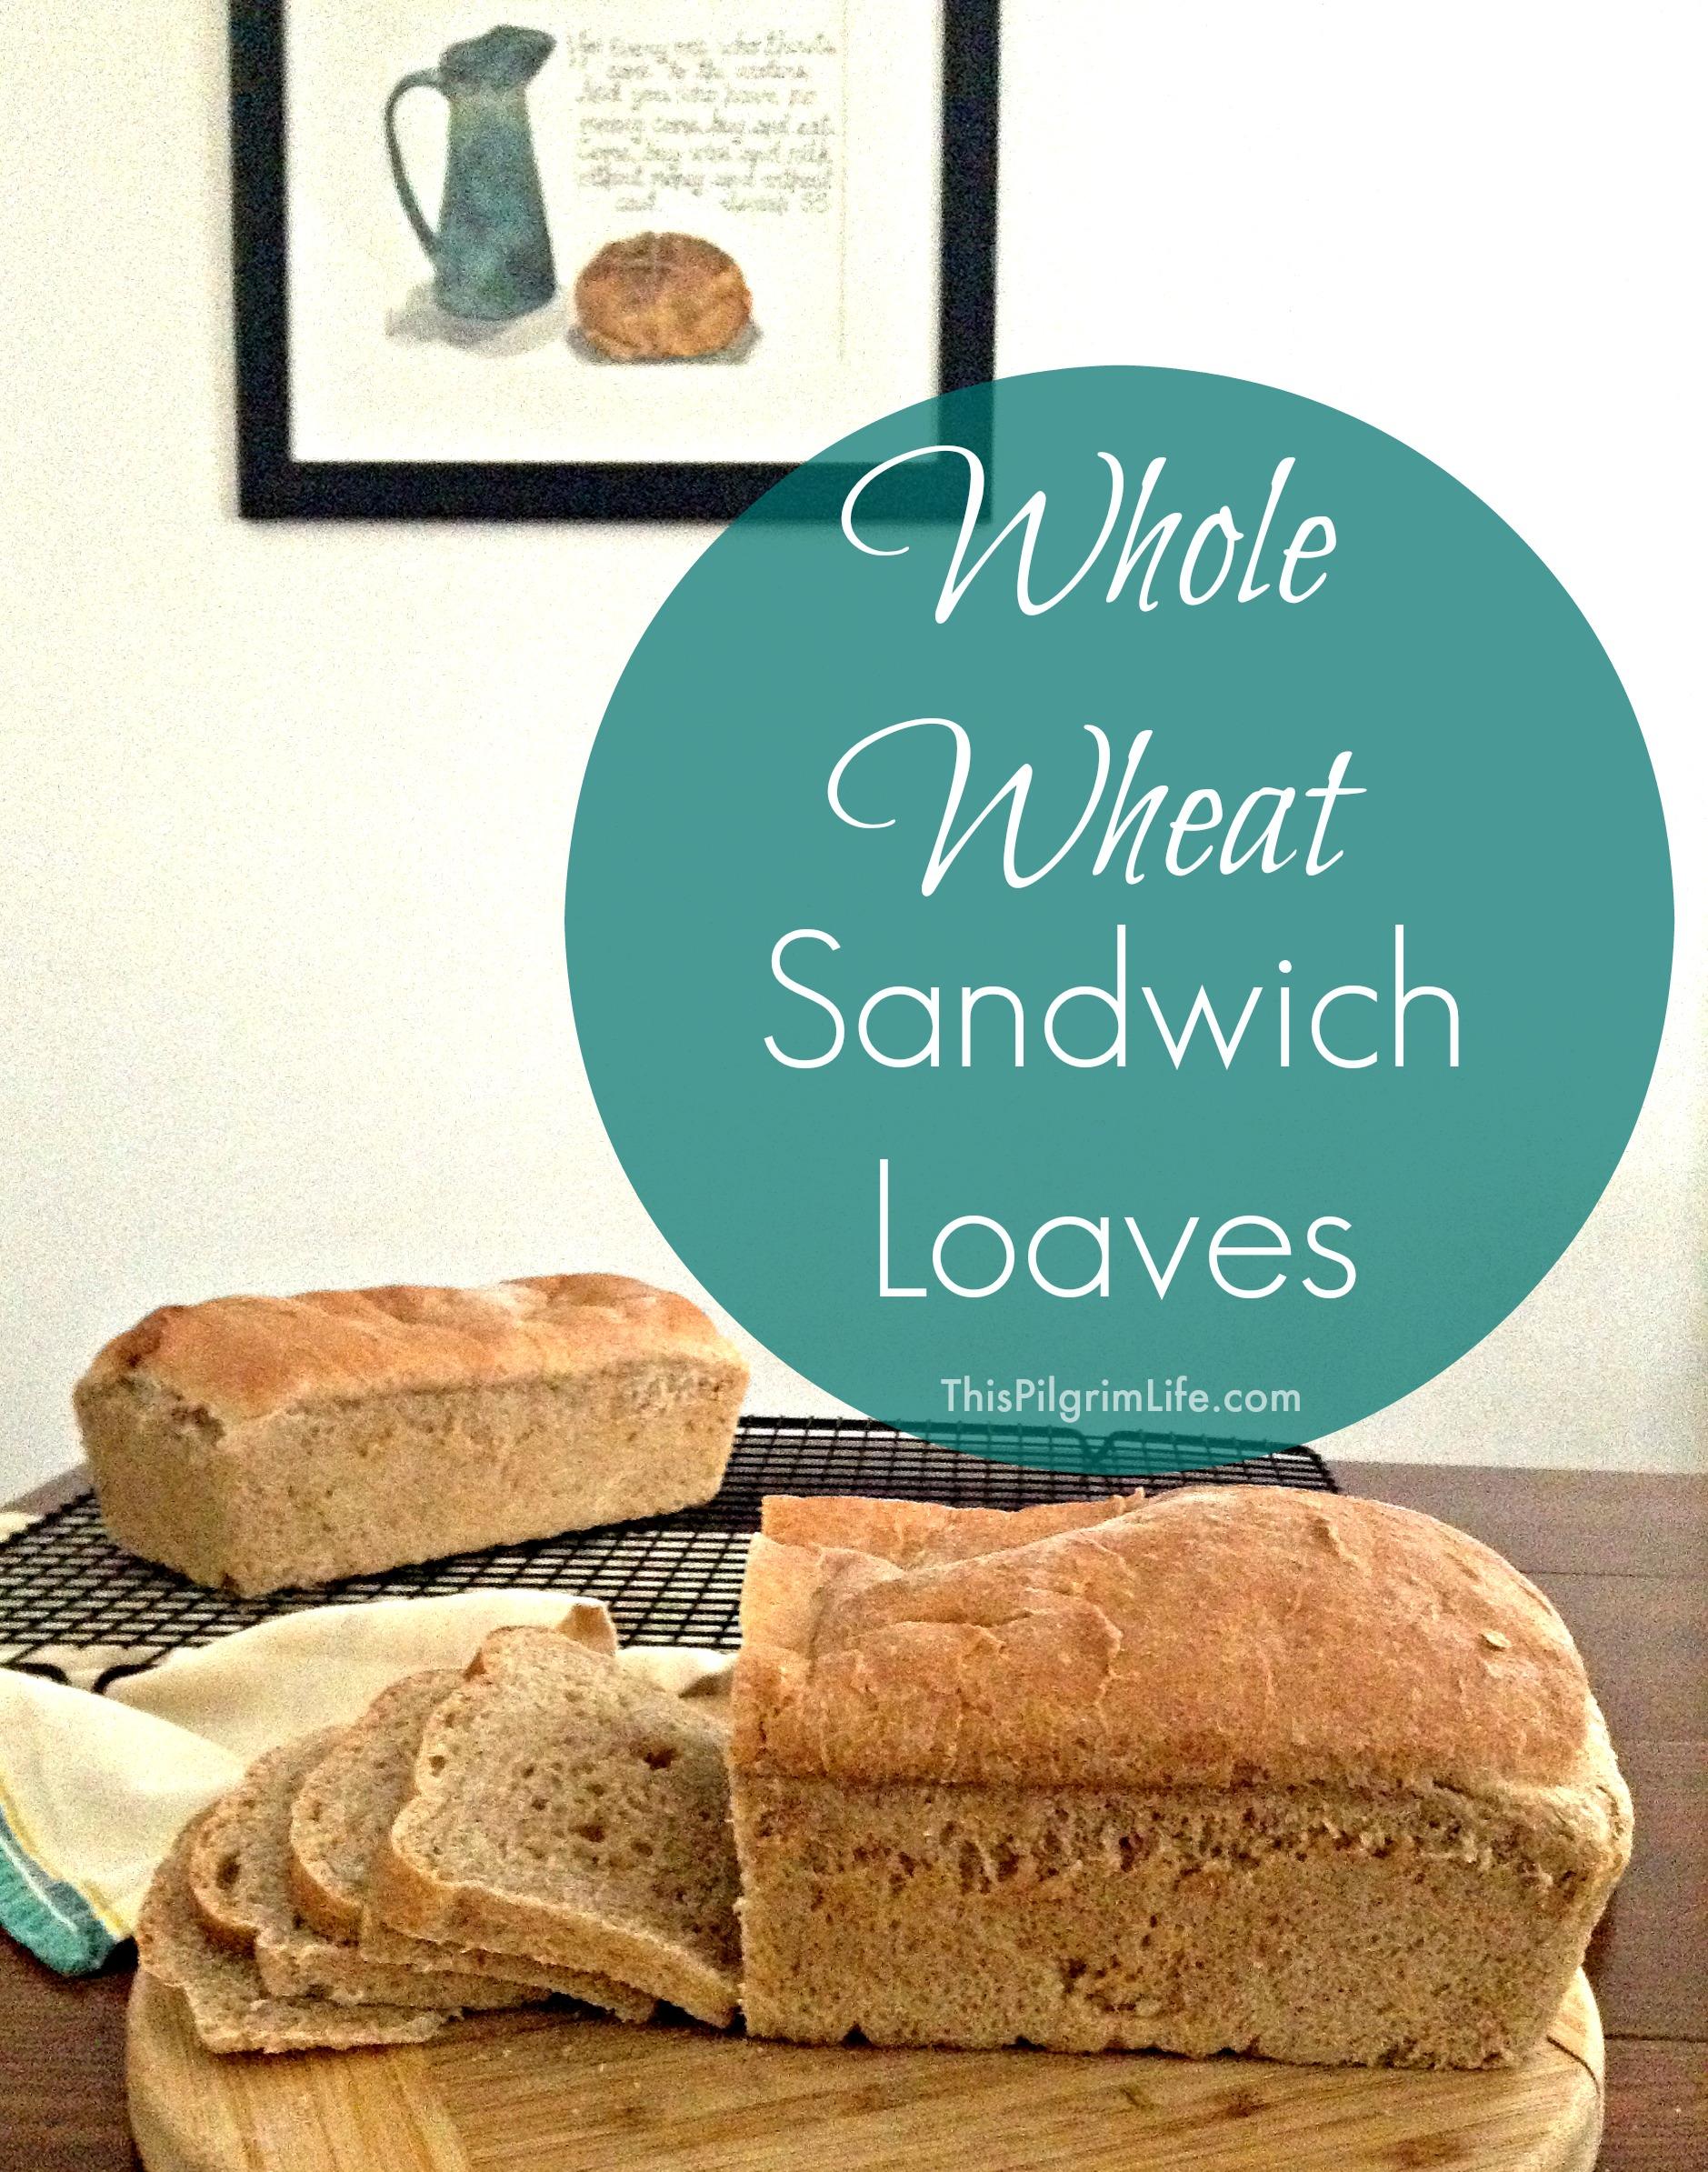 Whole Wheat Sandwich Loaves - This Pilgrim Life